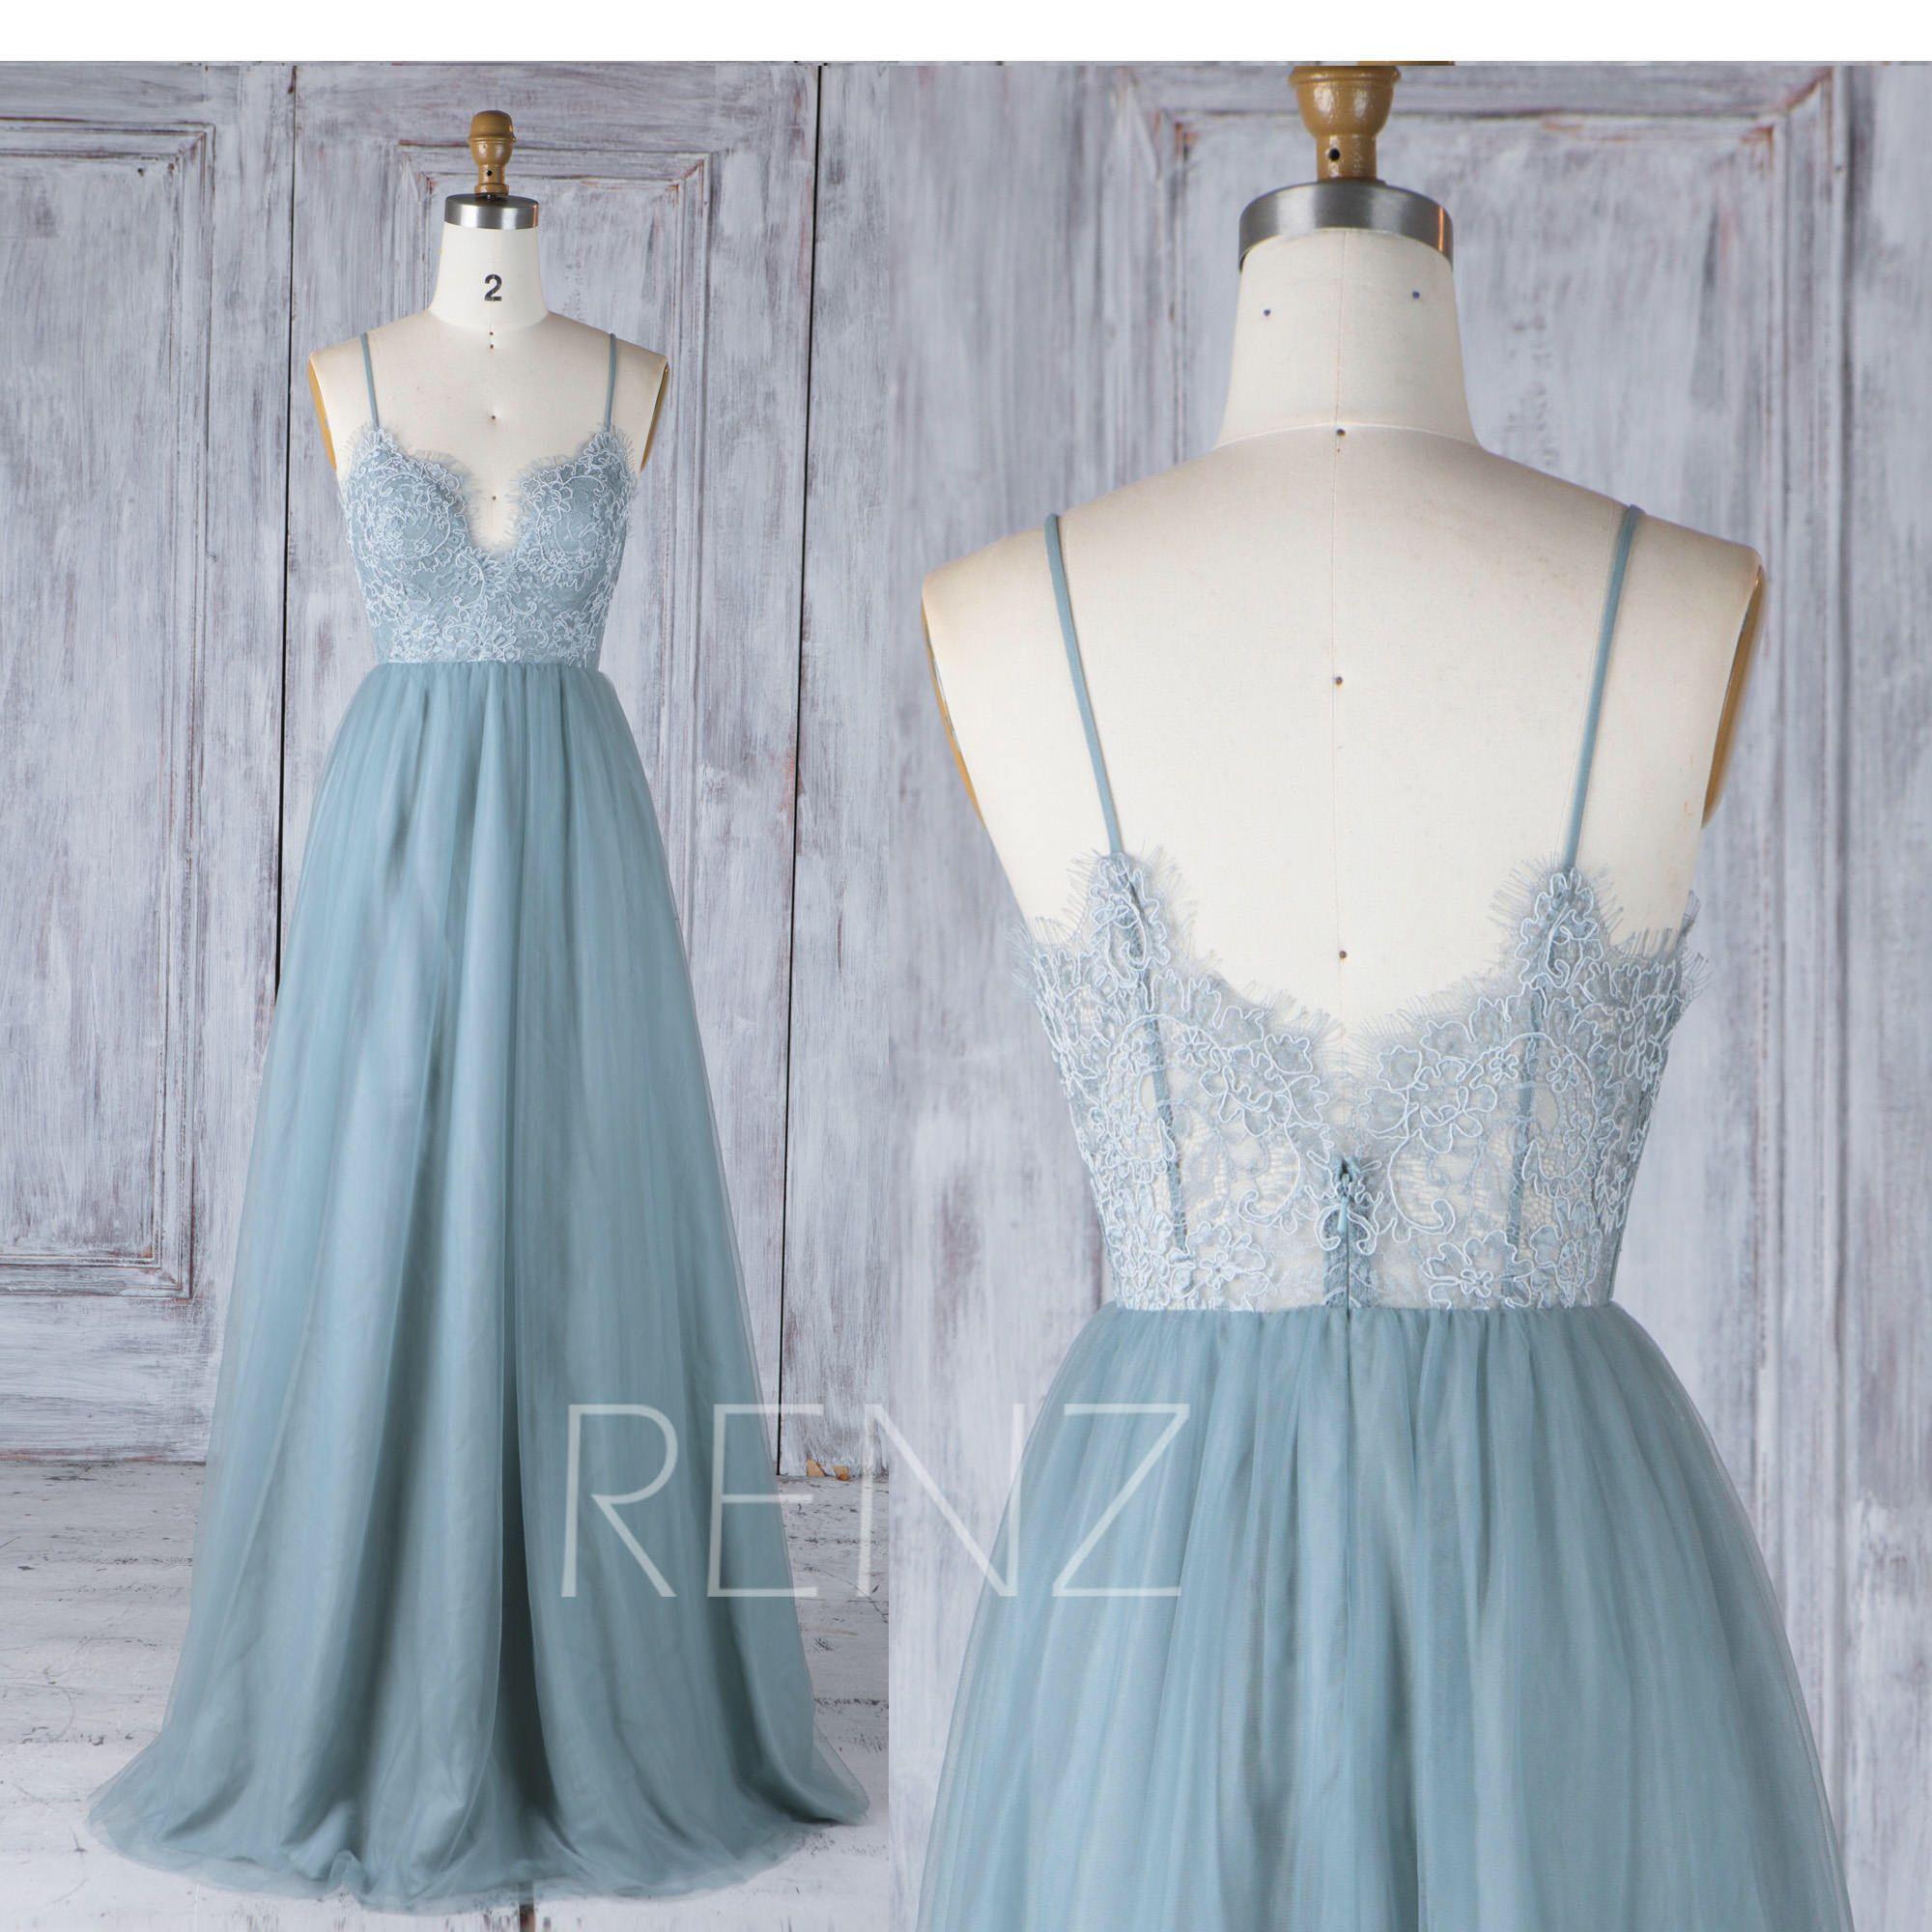 Bridesmaid Dress Dusty Blue Tulle Dress,Wedding Dress,Lace Illusion ...